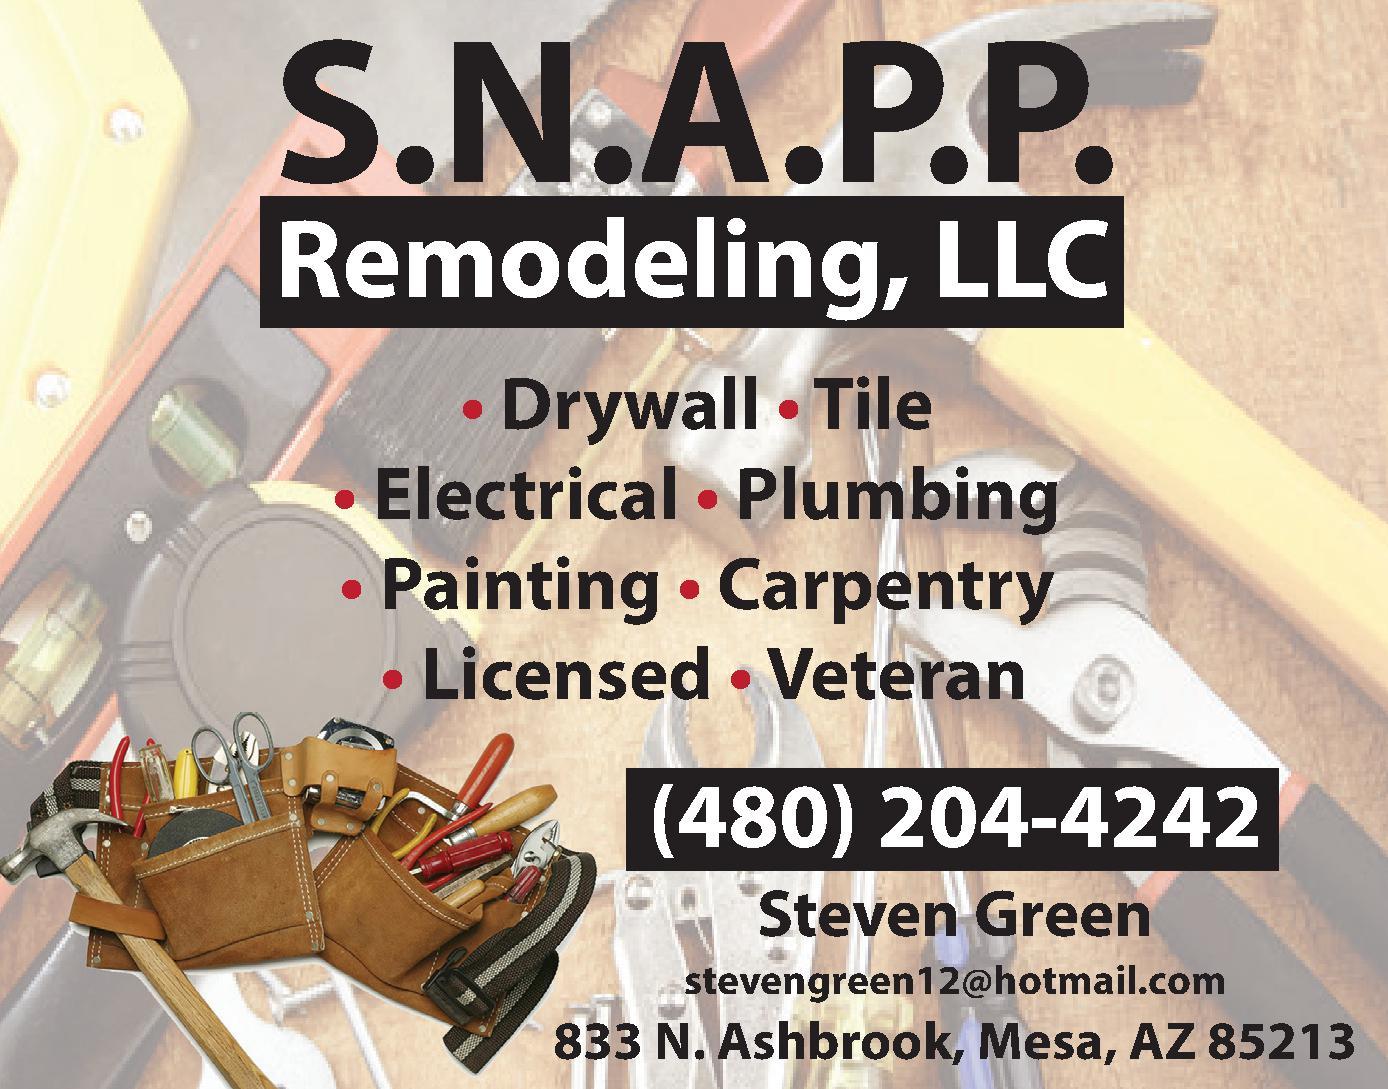 S.N.A.P.P. Remodeling LLC